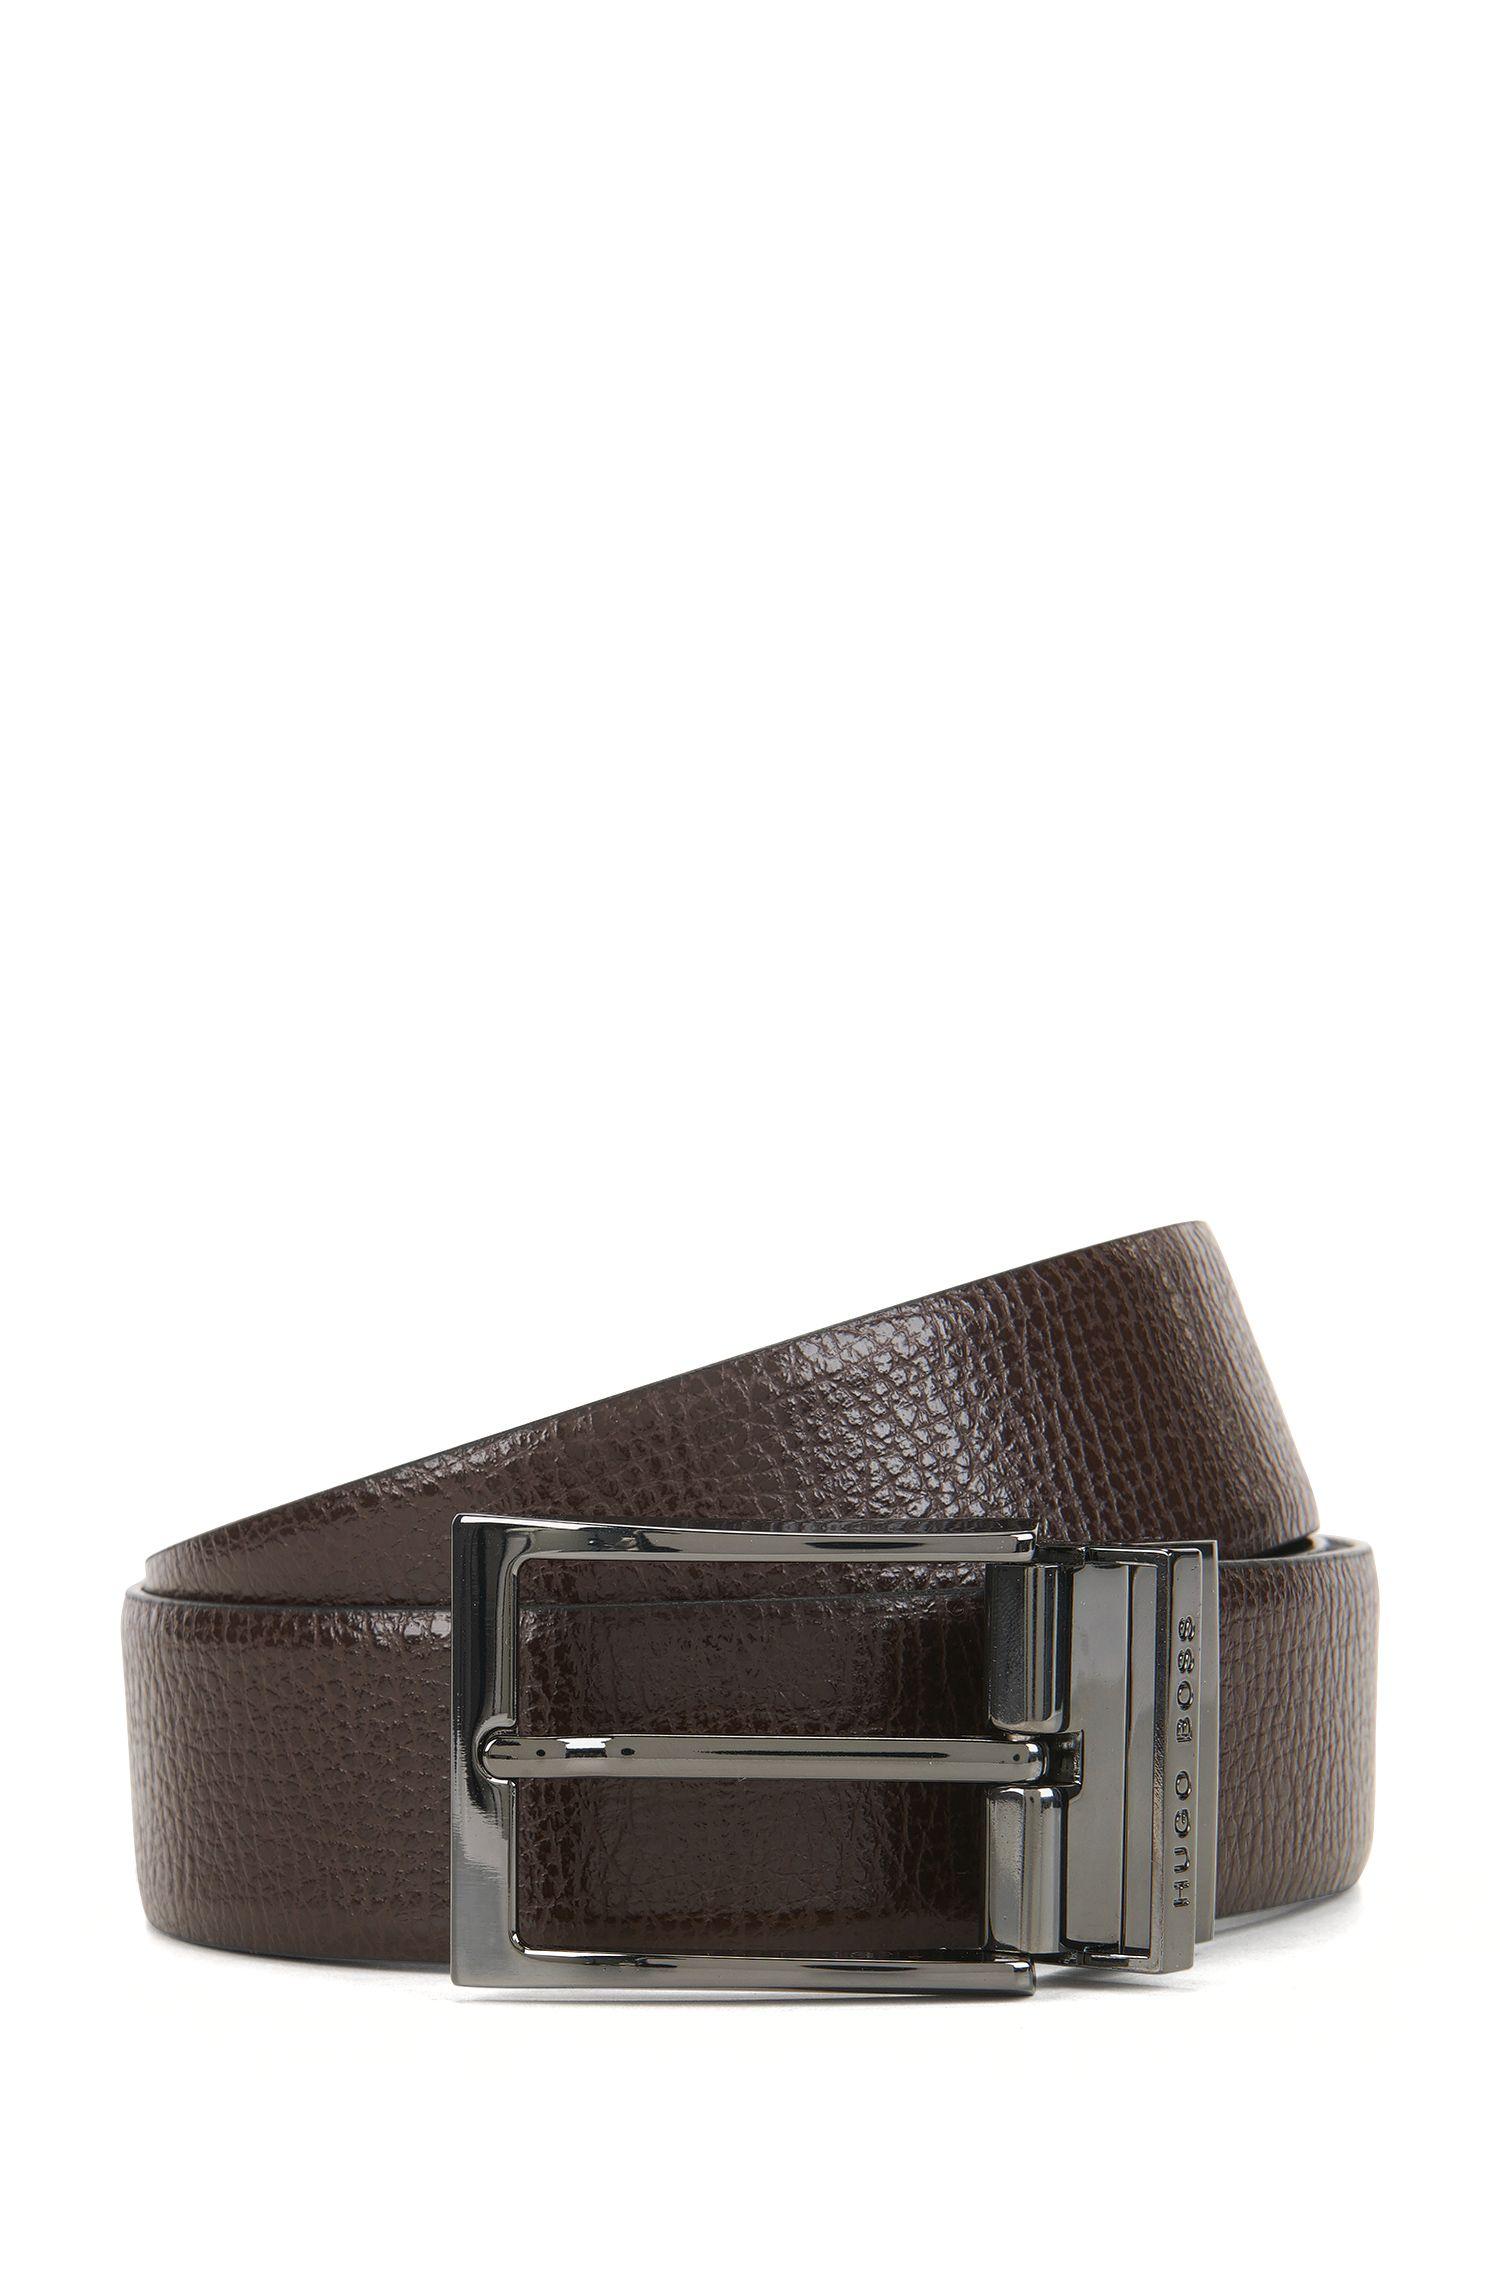 Cintura reversibile in pelle a contrasto con passante inciso